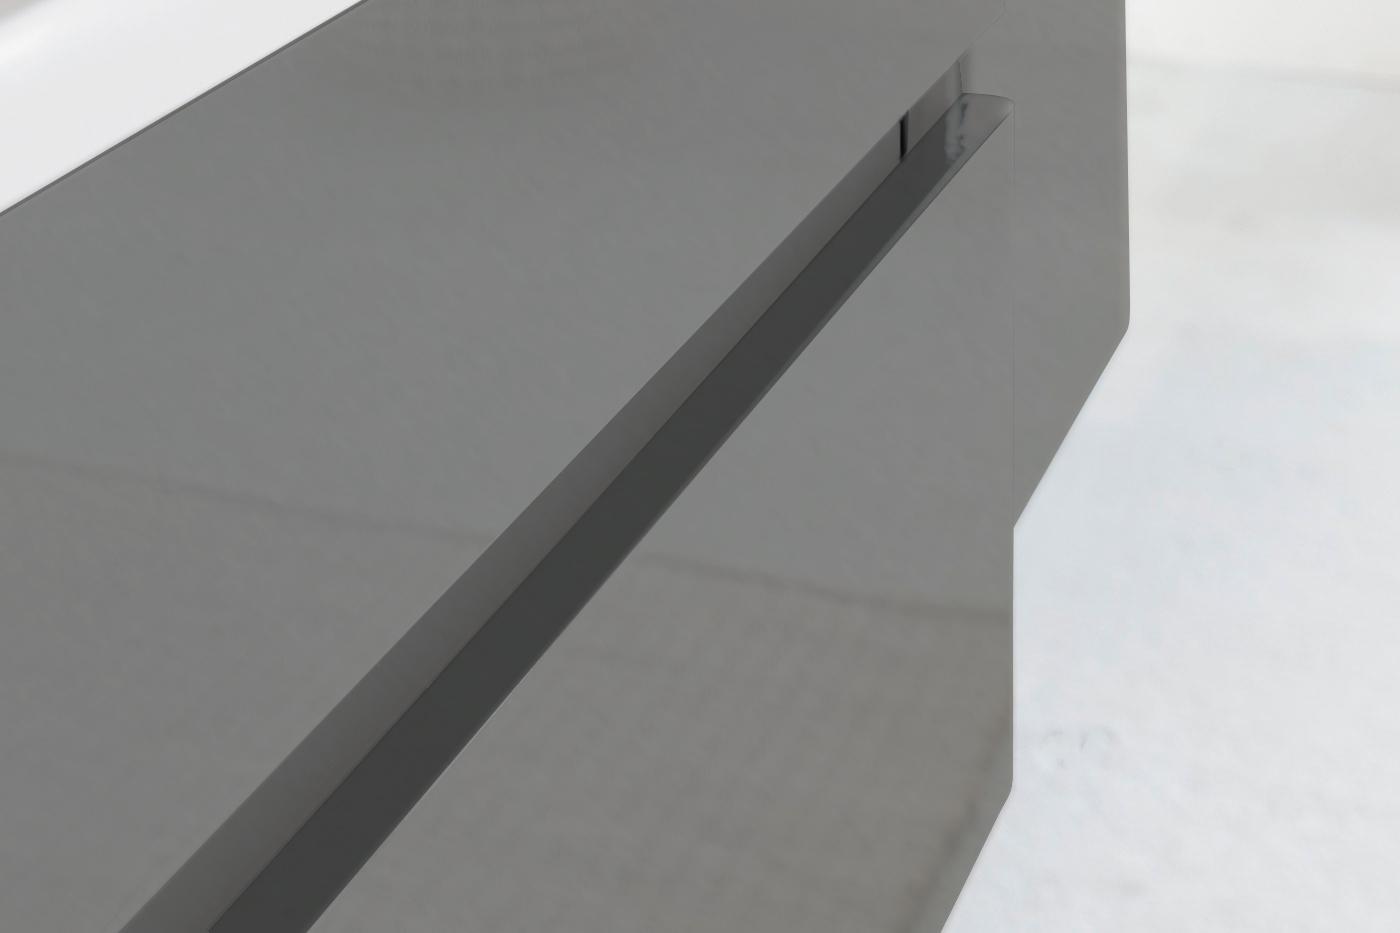 sam badezimmerm bel parma 4tlg grau hochglanz 80 cm. Black Bedroom Furniture Sets. Home Design Ideas